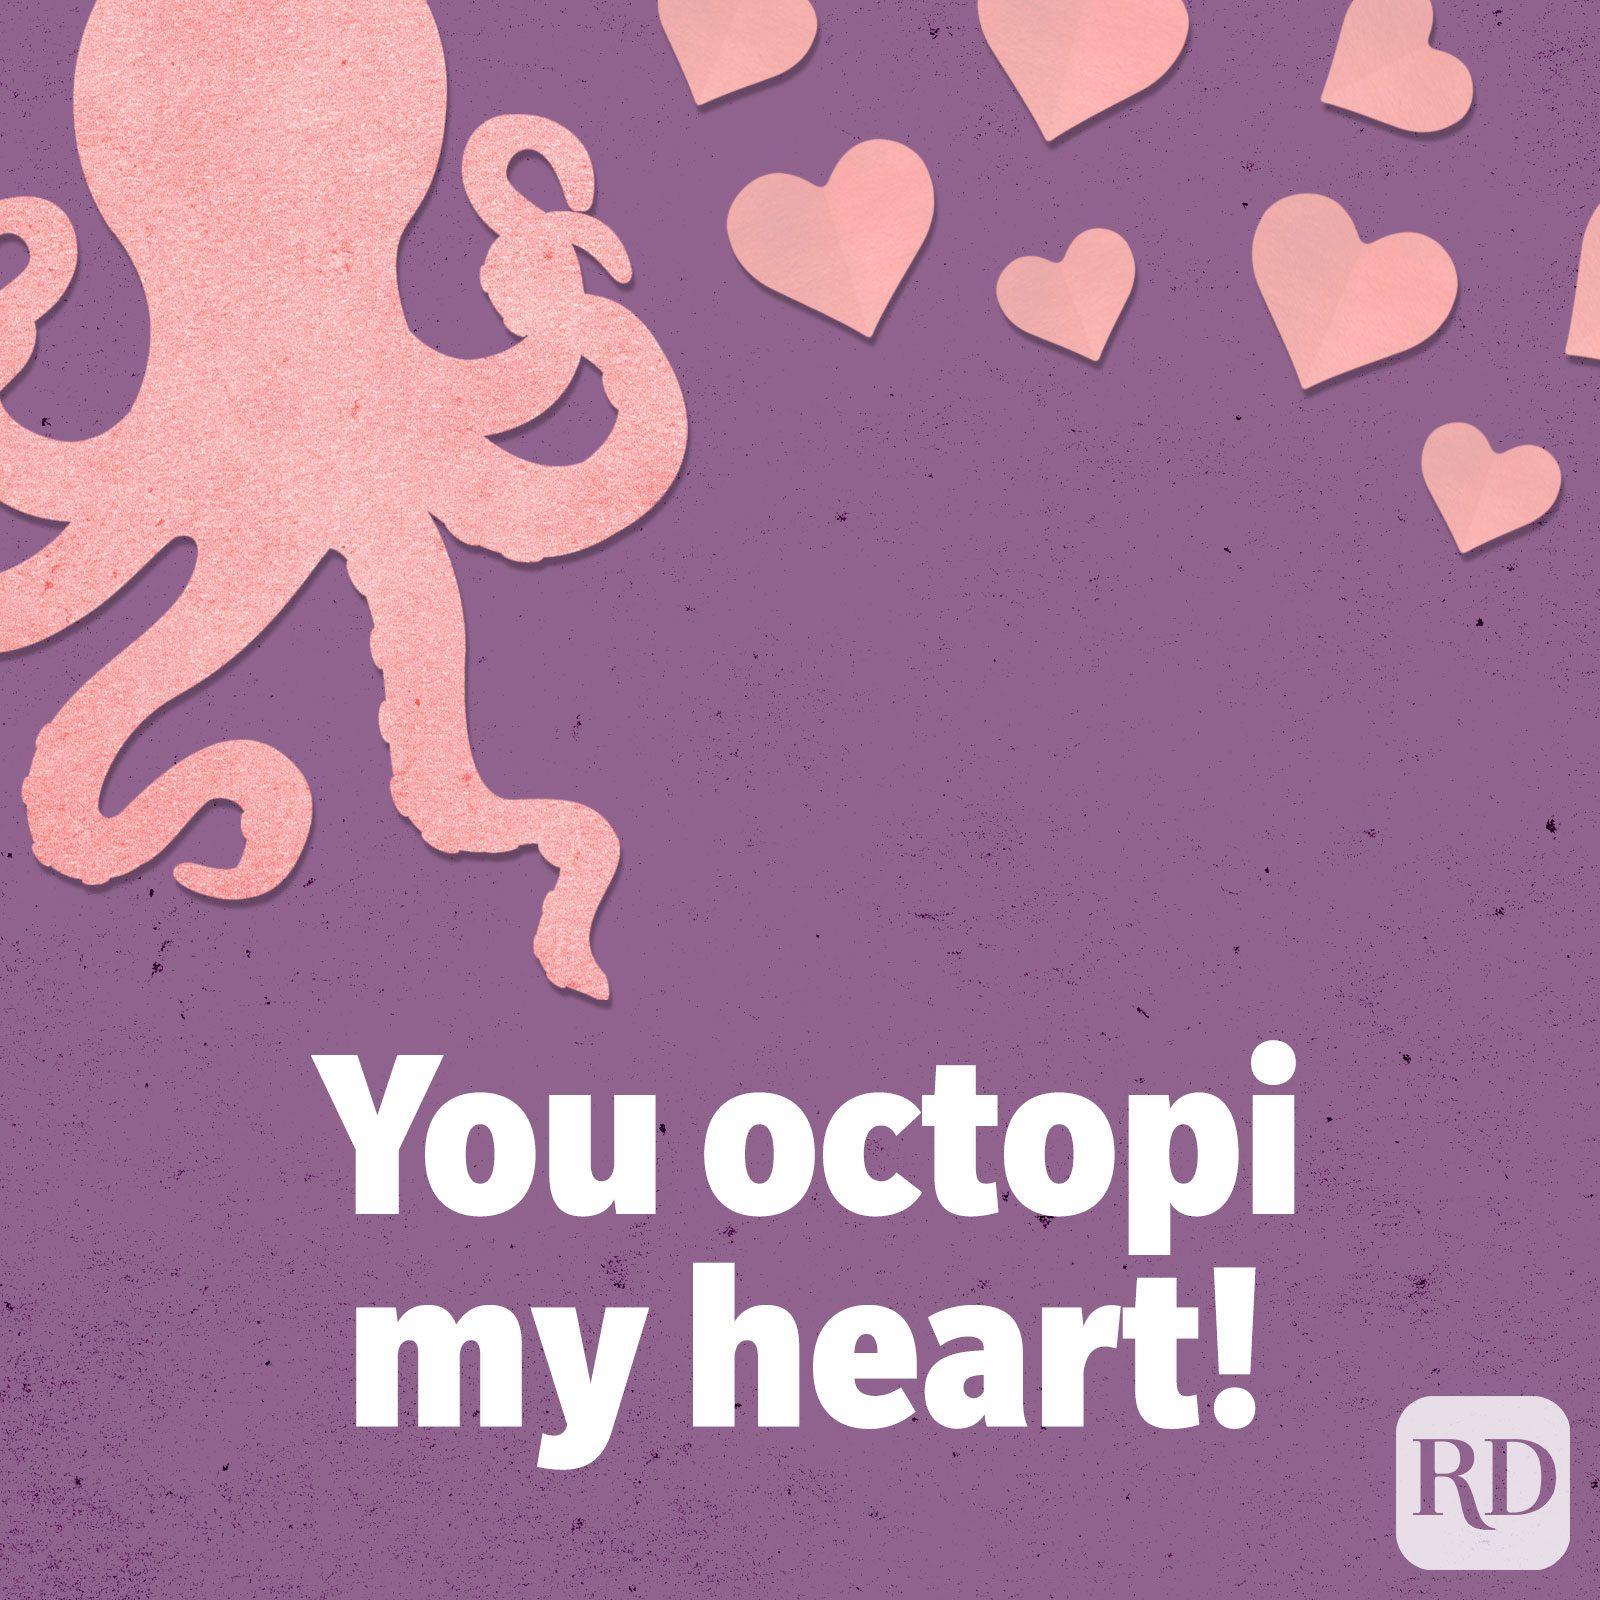 You octopi my heart!